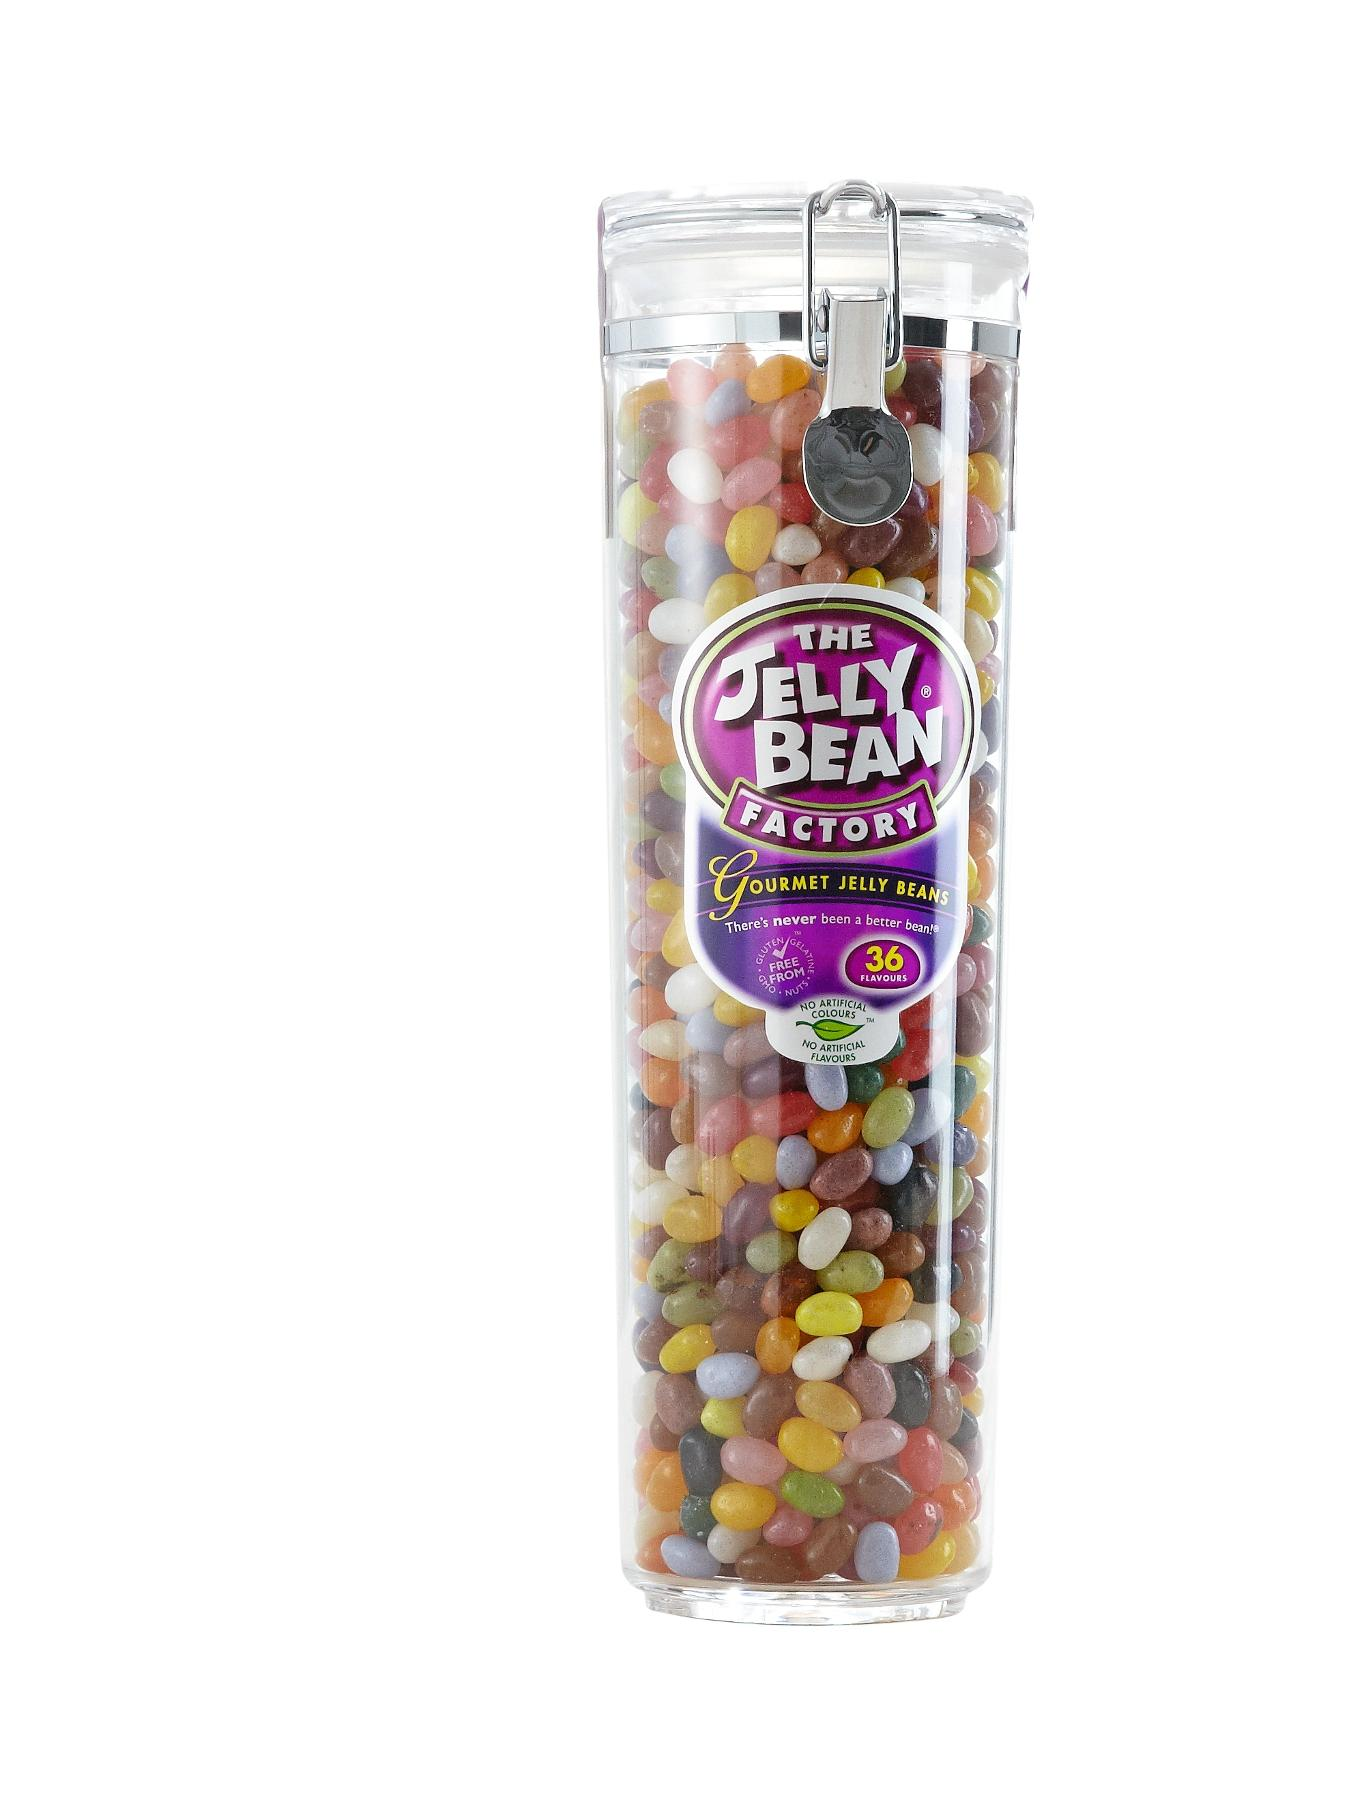 1.3kg Spaghetti Jar of Gourmet Jelly Beans